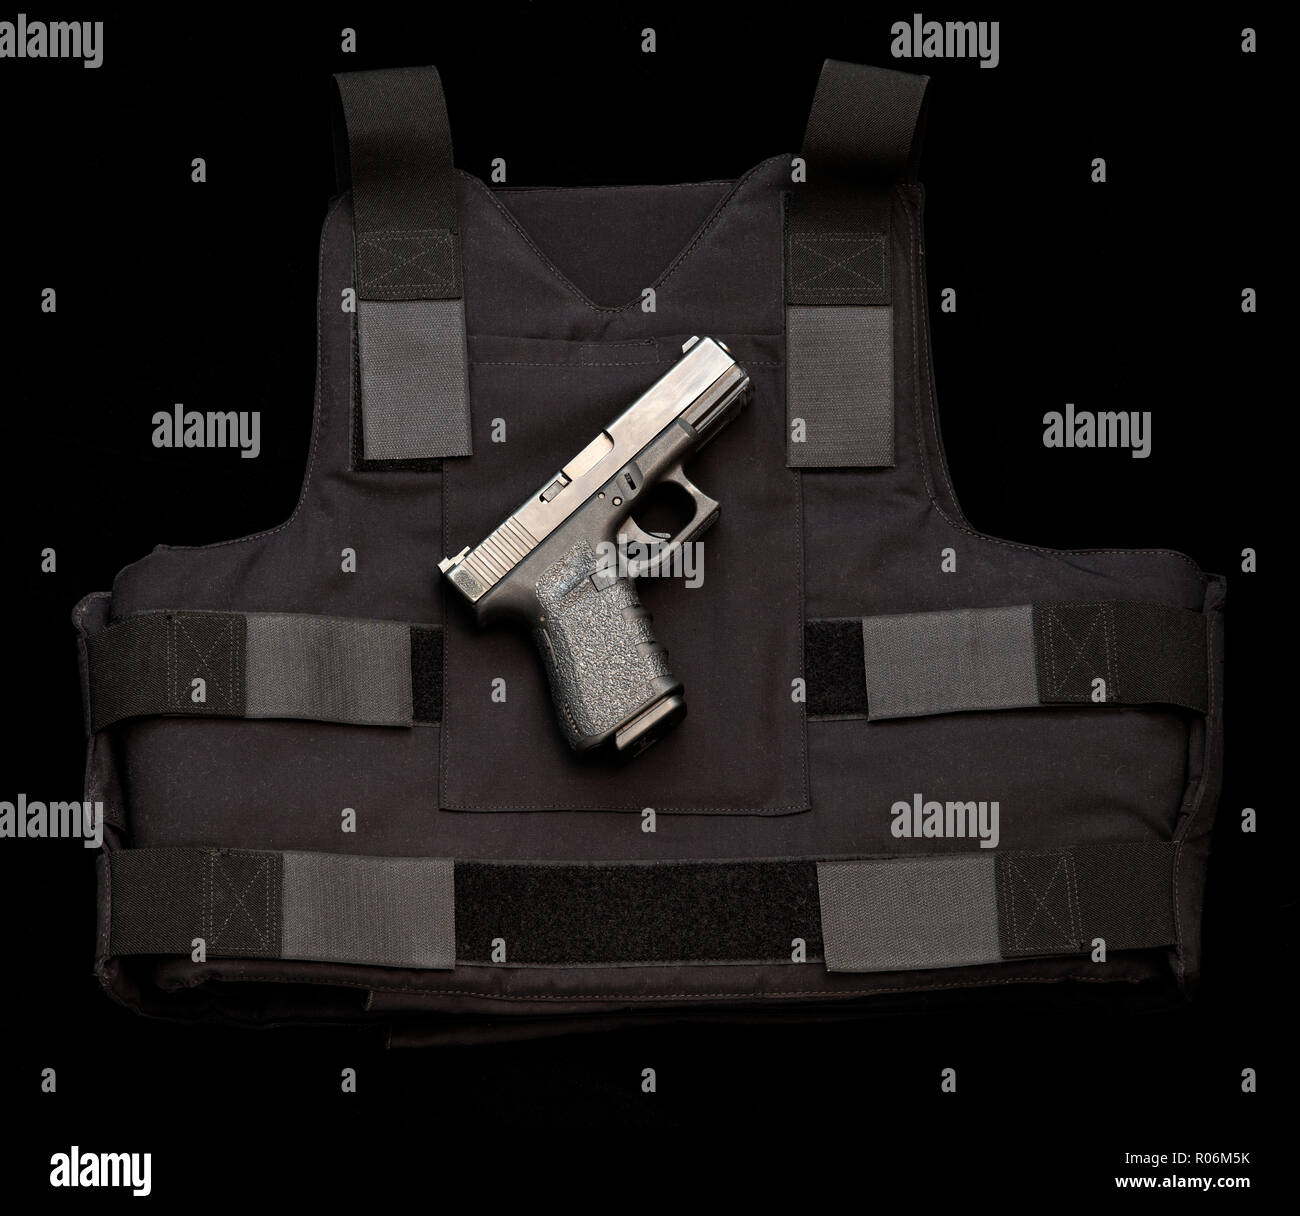 Glock semiautomatic pistol and bulletproof vest. Stock Photo